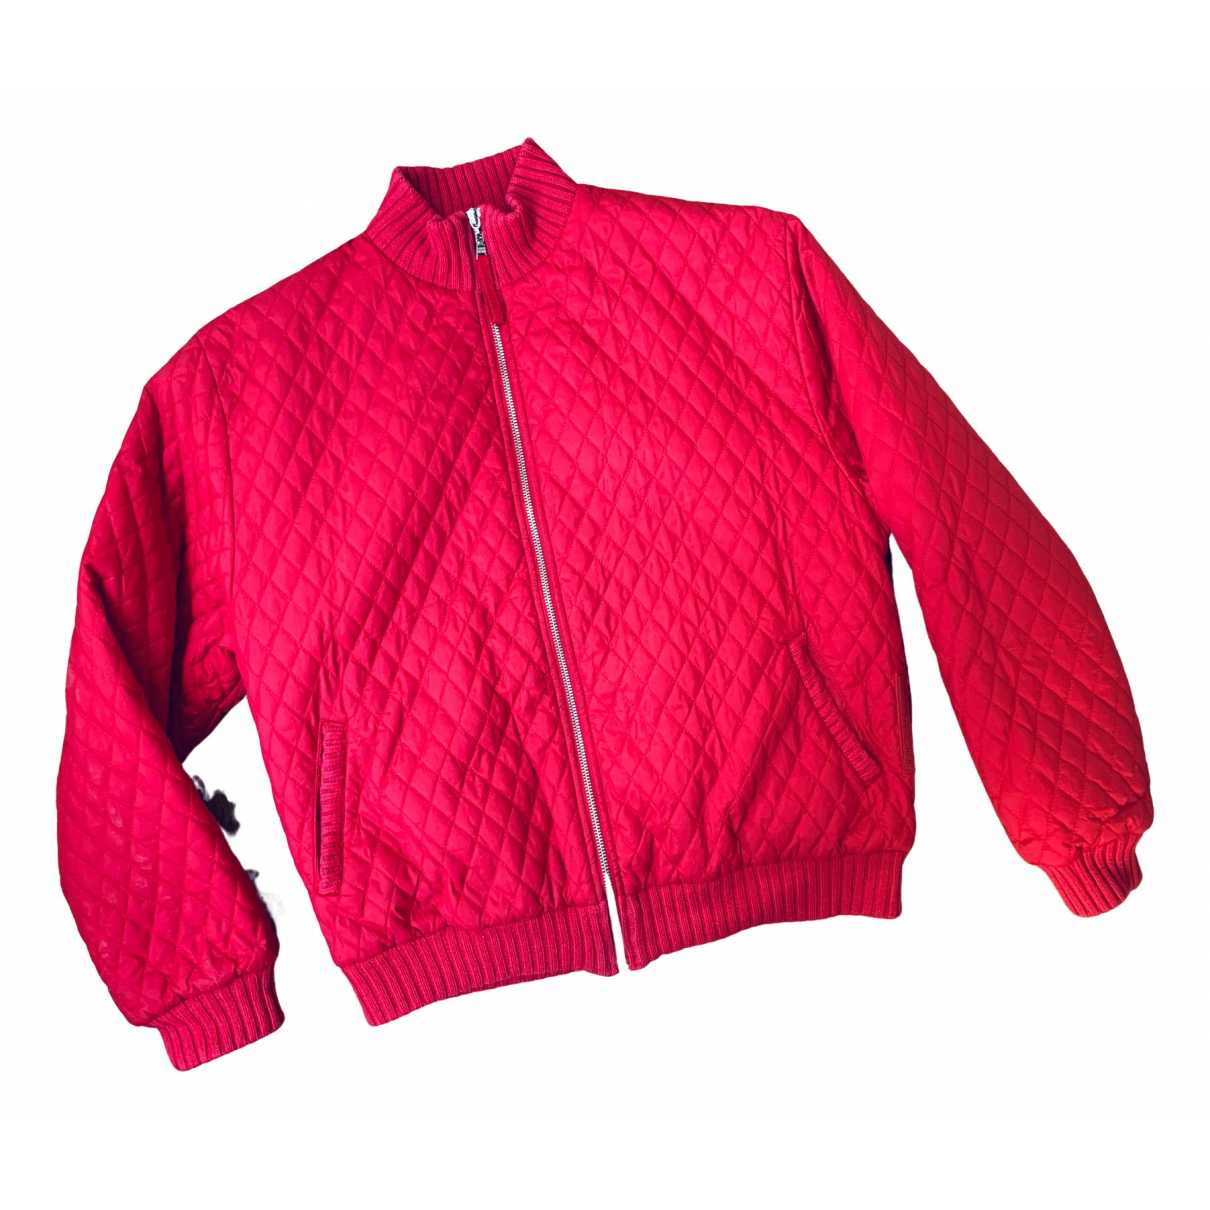 Prada \N Jacke in  Rot Polyester